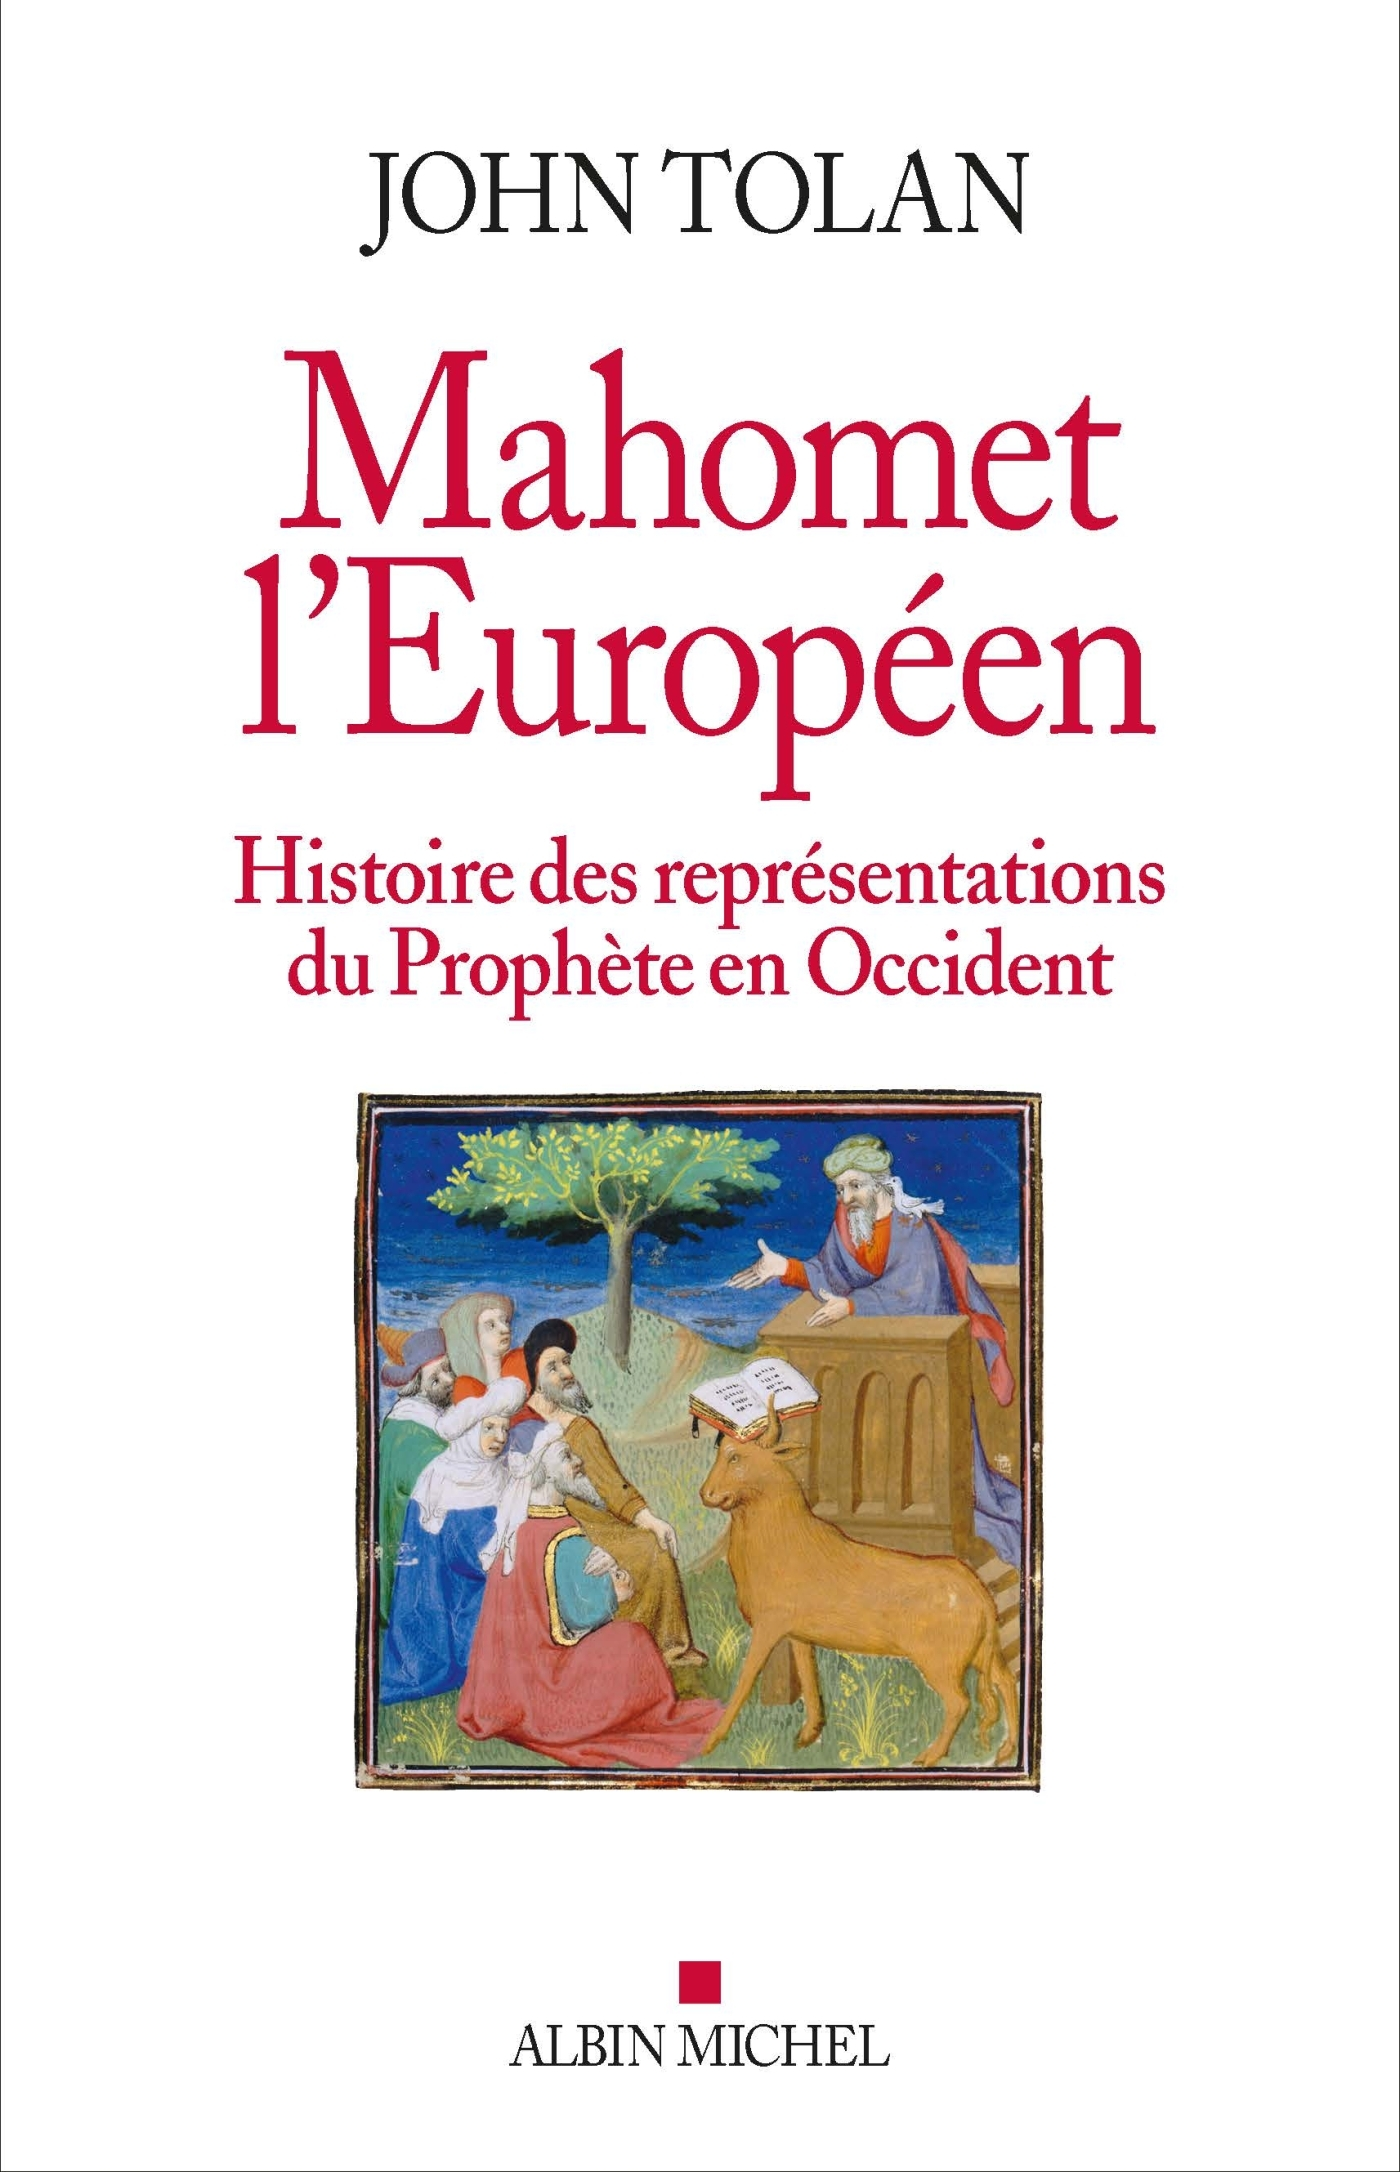 MAHOMET L'EUROPEEN - HISTOIRE DES REPRESENTATIONS DU PROPHETE EN OCCIDENT